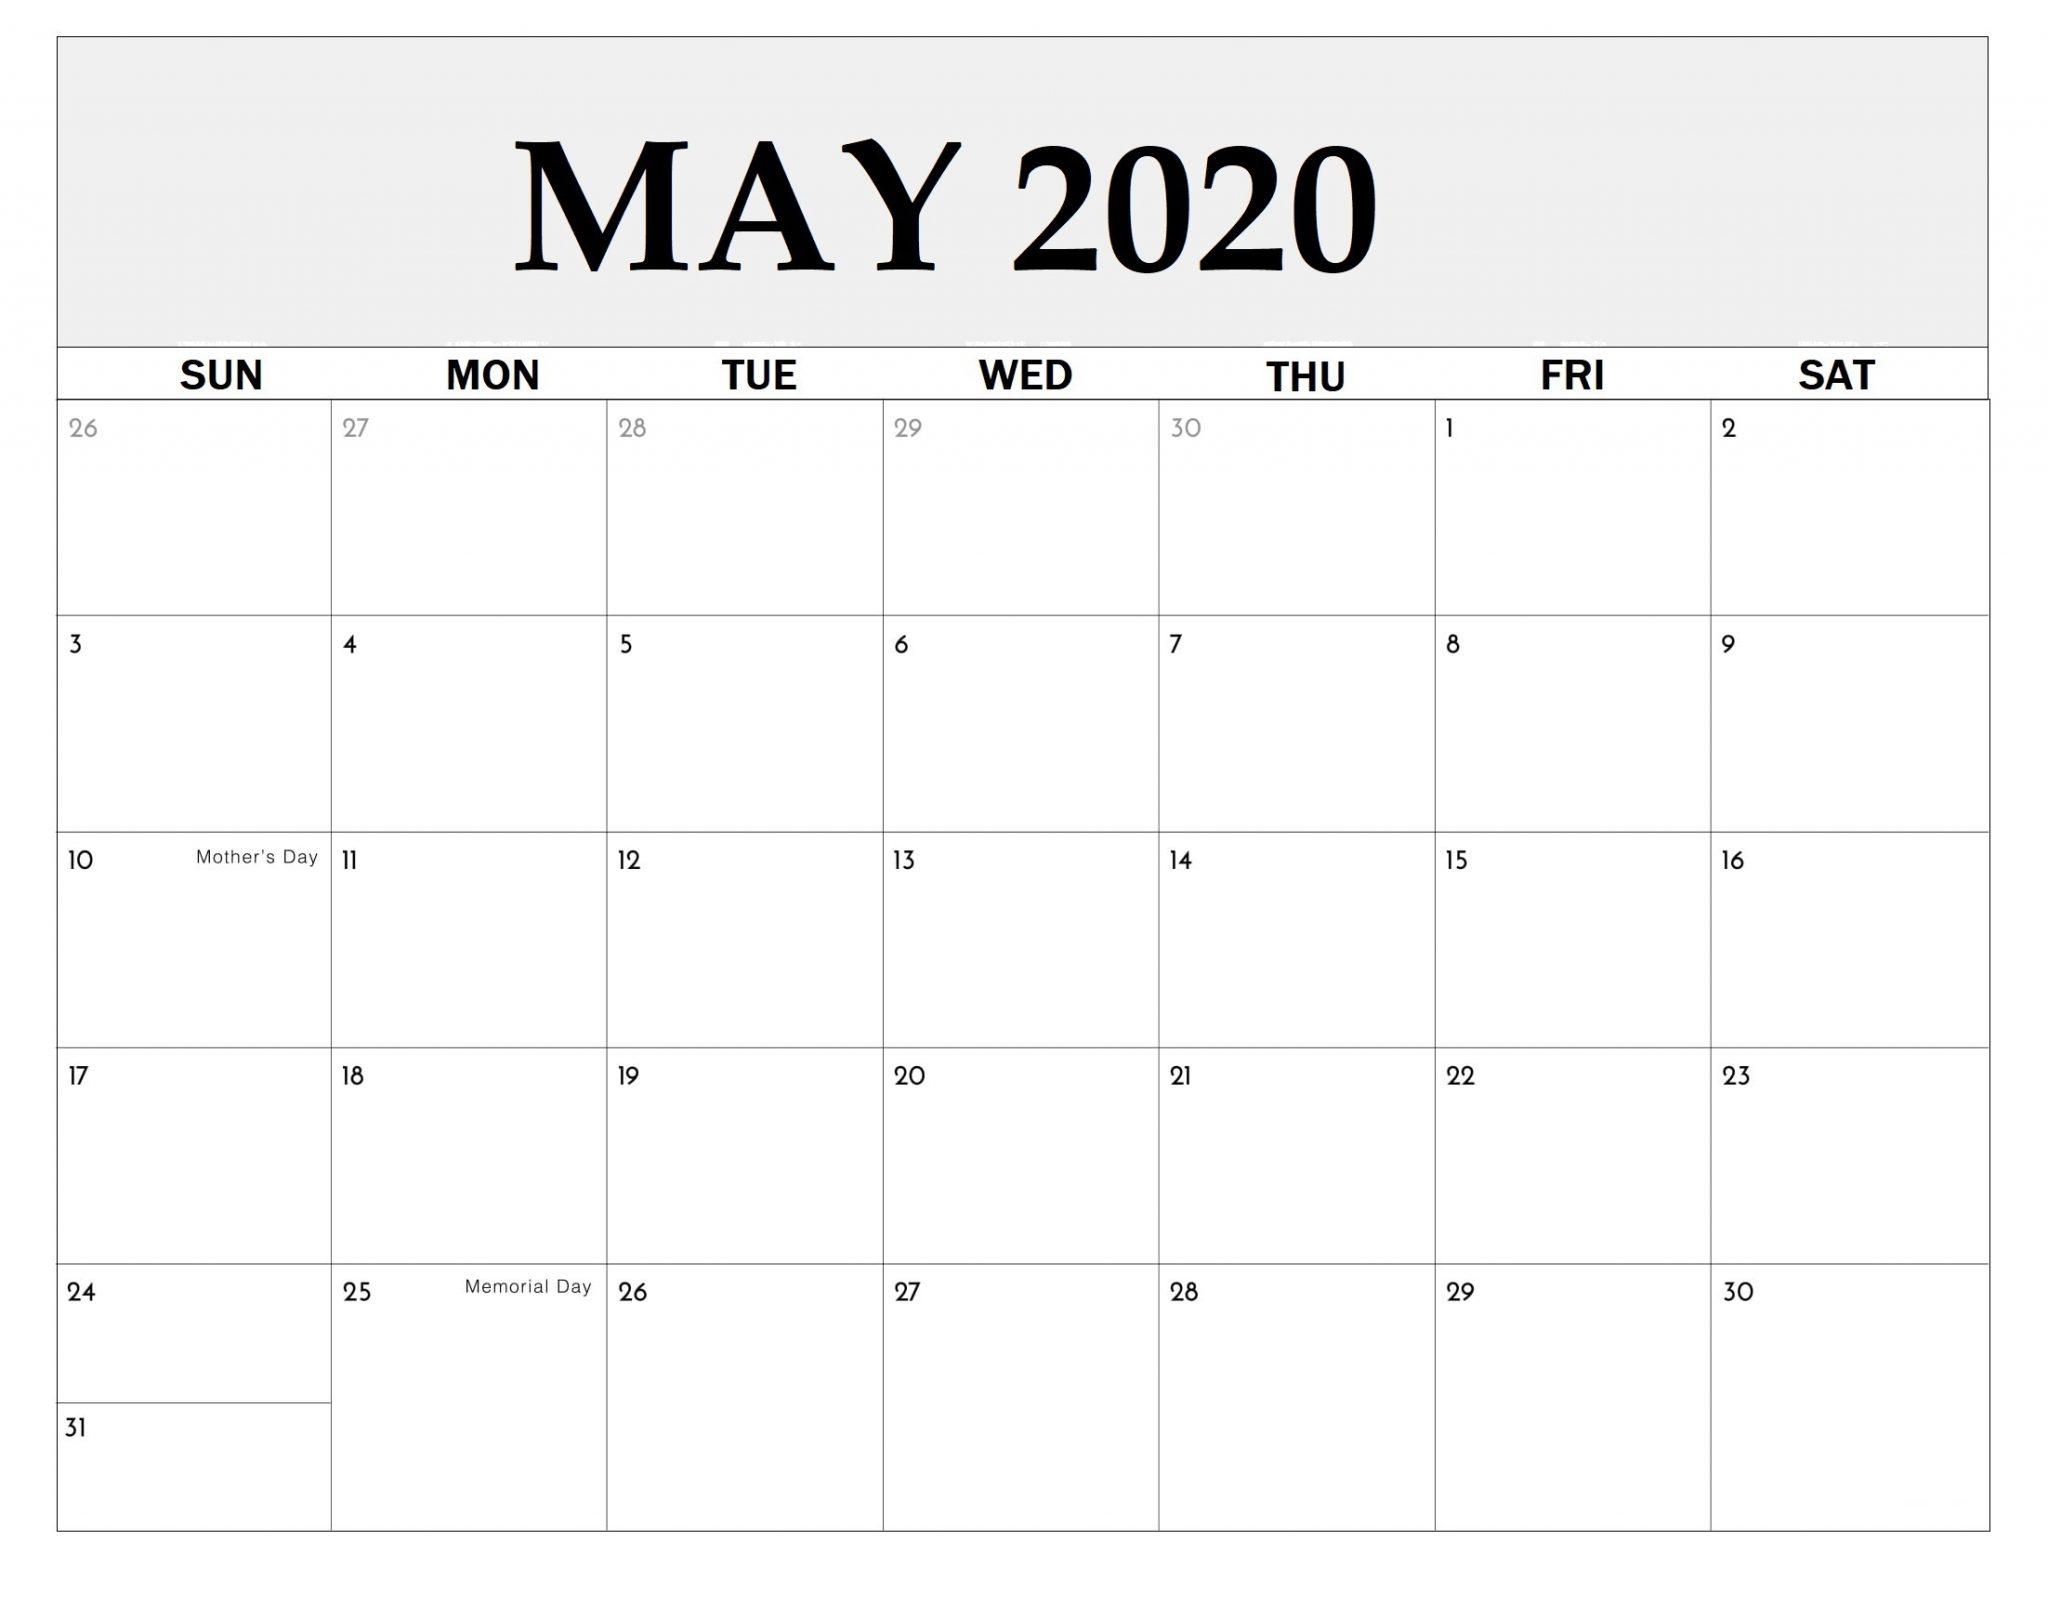 May 2020 Calendar - Free 2020 Printable Calendar Blank Templates 2020 Holidays